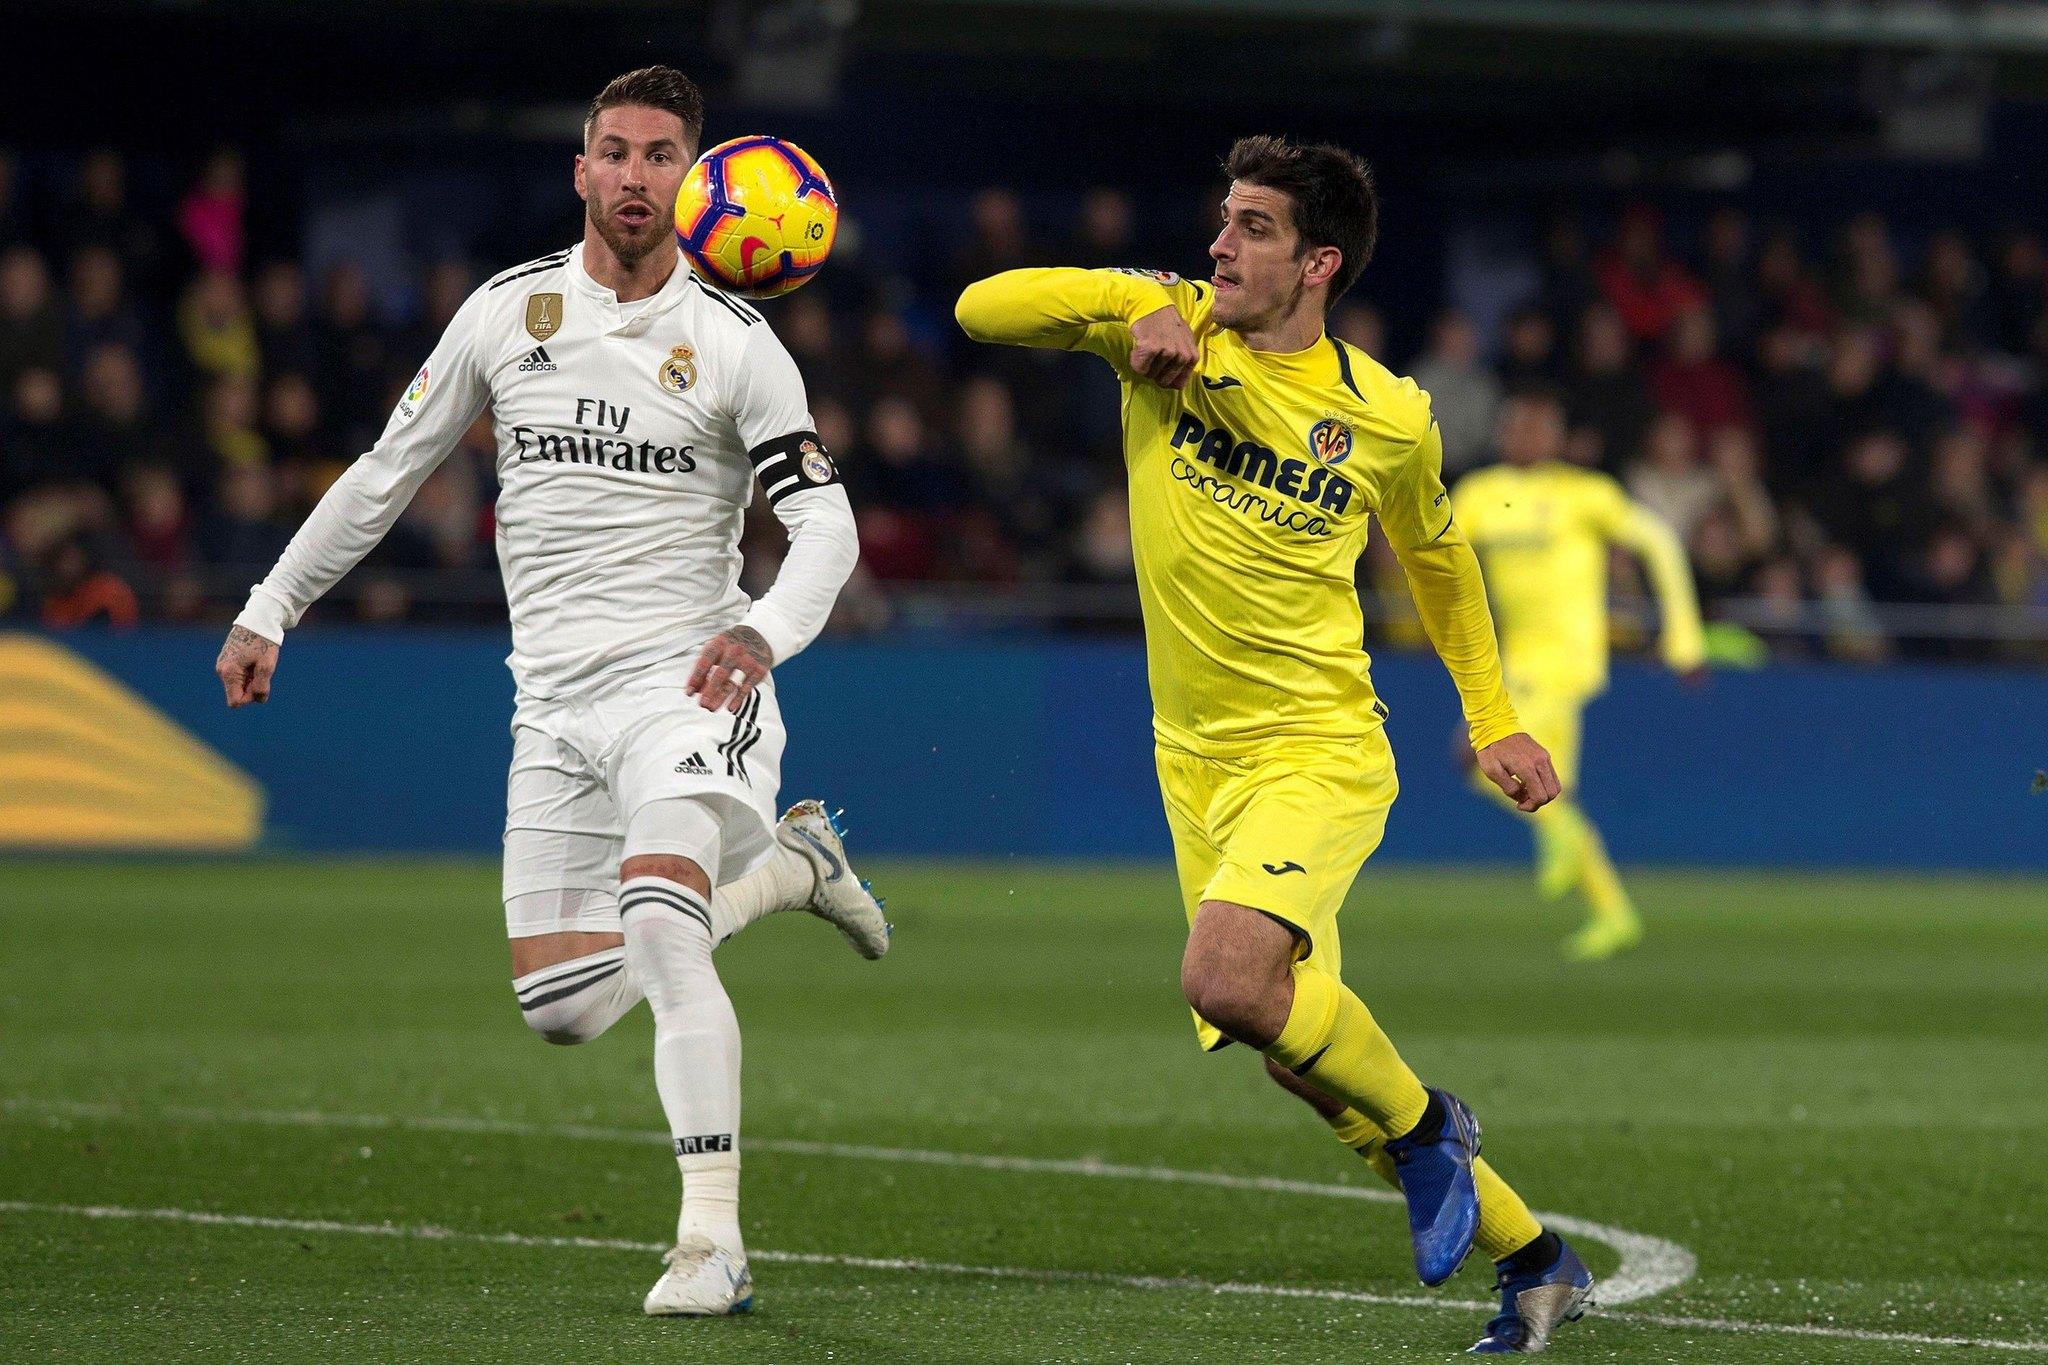 Soi kèo Mallorca vs Villarreal